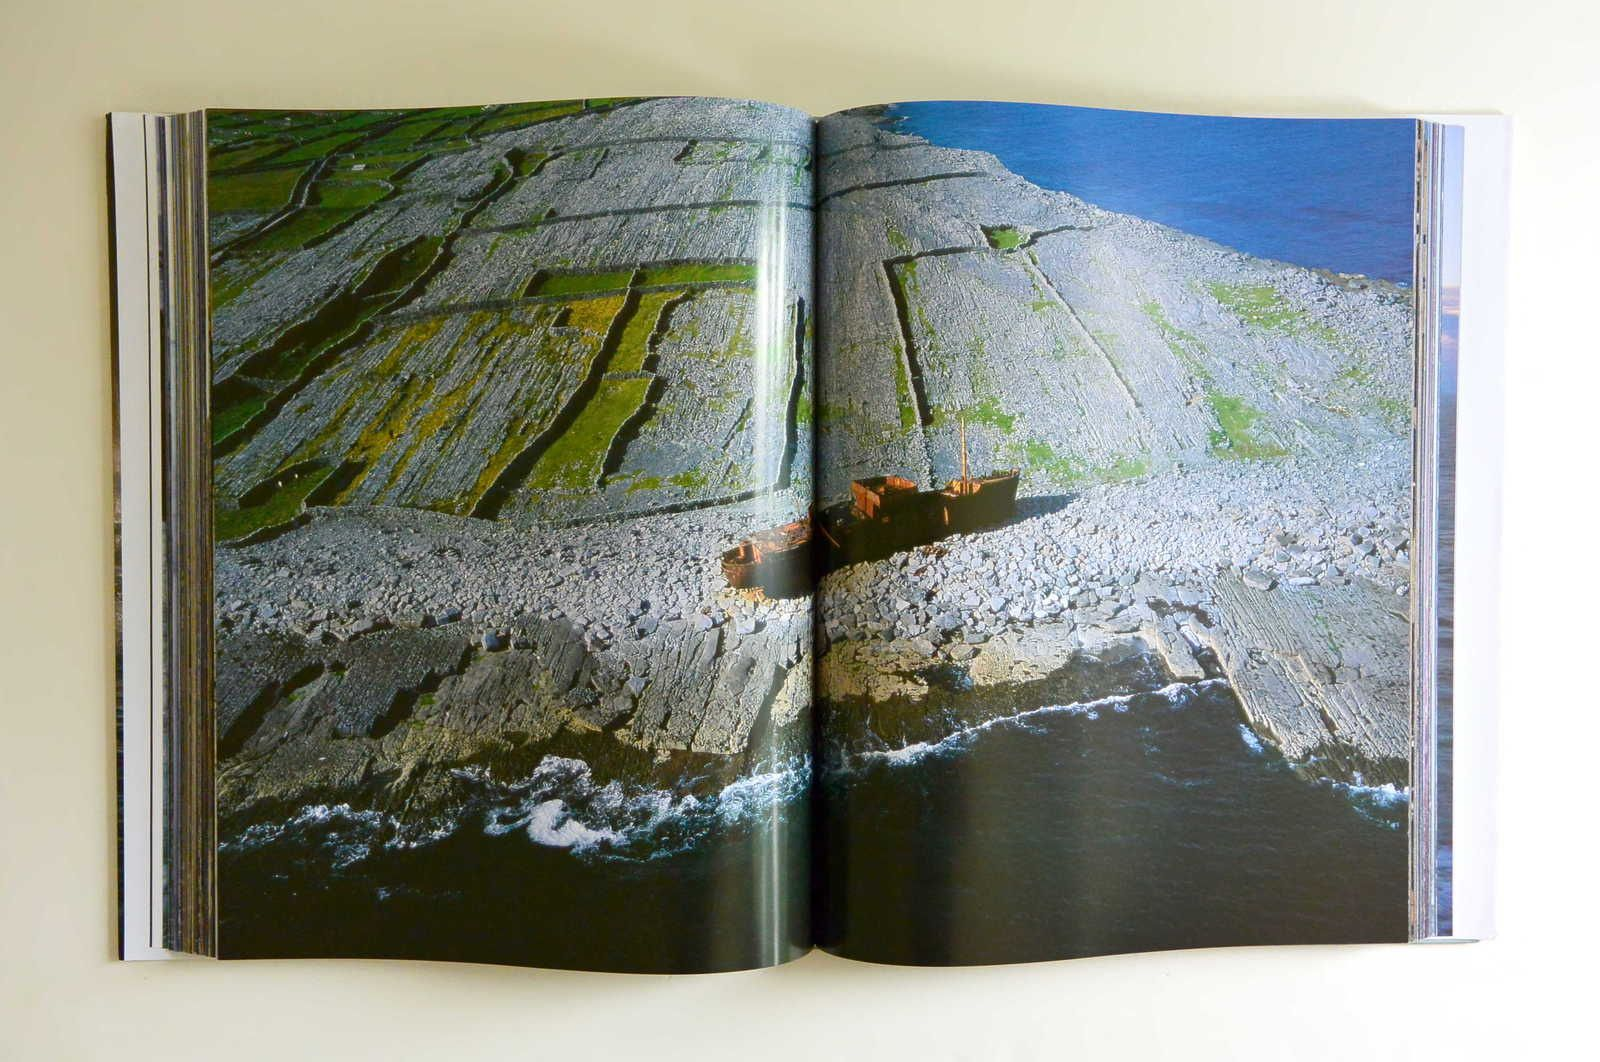 &quot&#x3B;La mer, avenir de la terre&quot&#x3B; P. Plisson - C. Buchet, ed. Martinière 2006